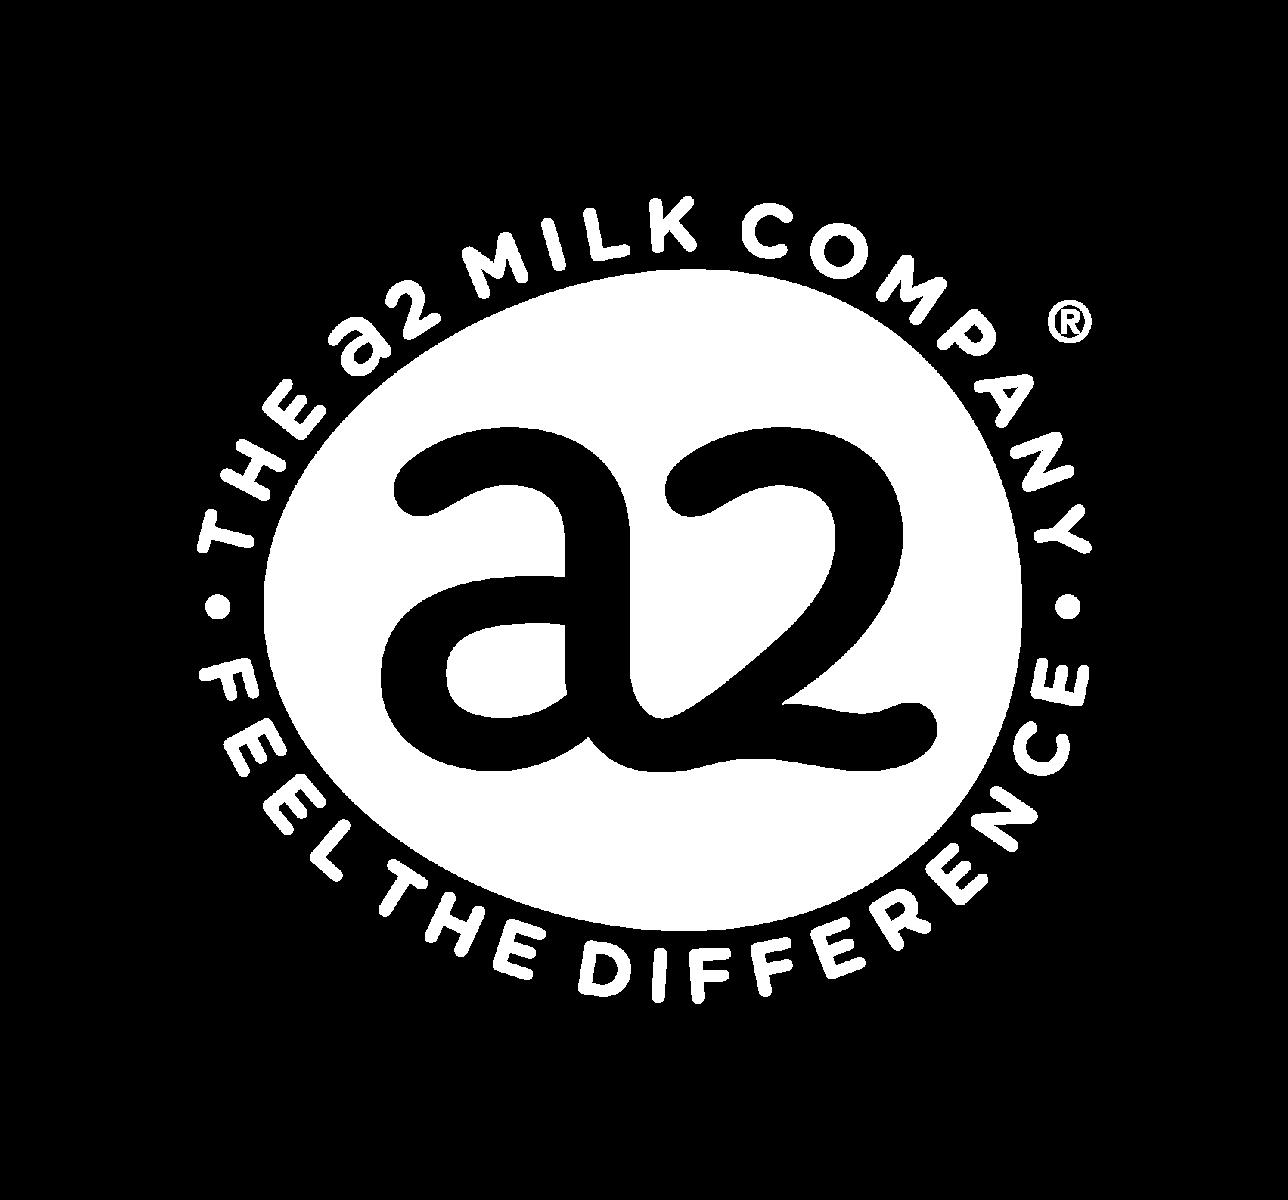 The A2 Milk